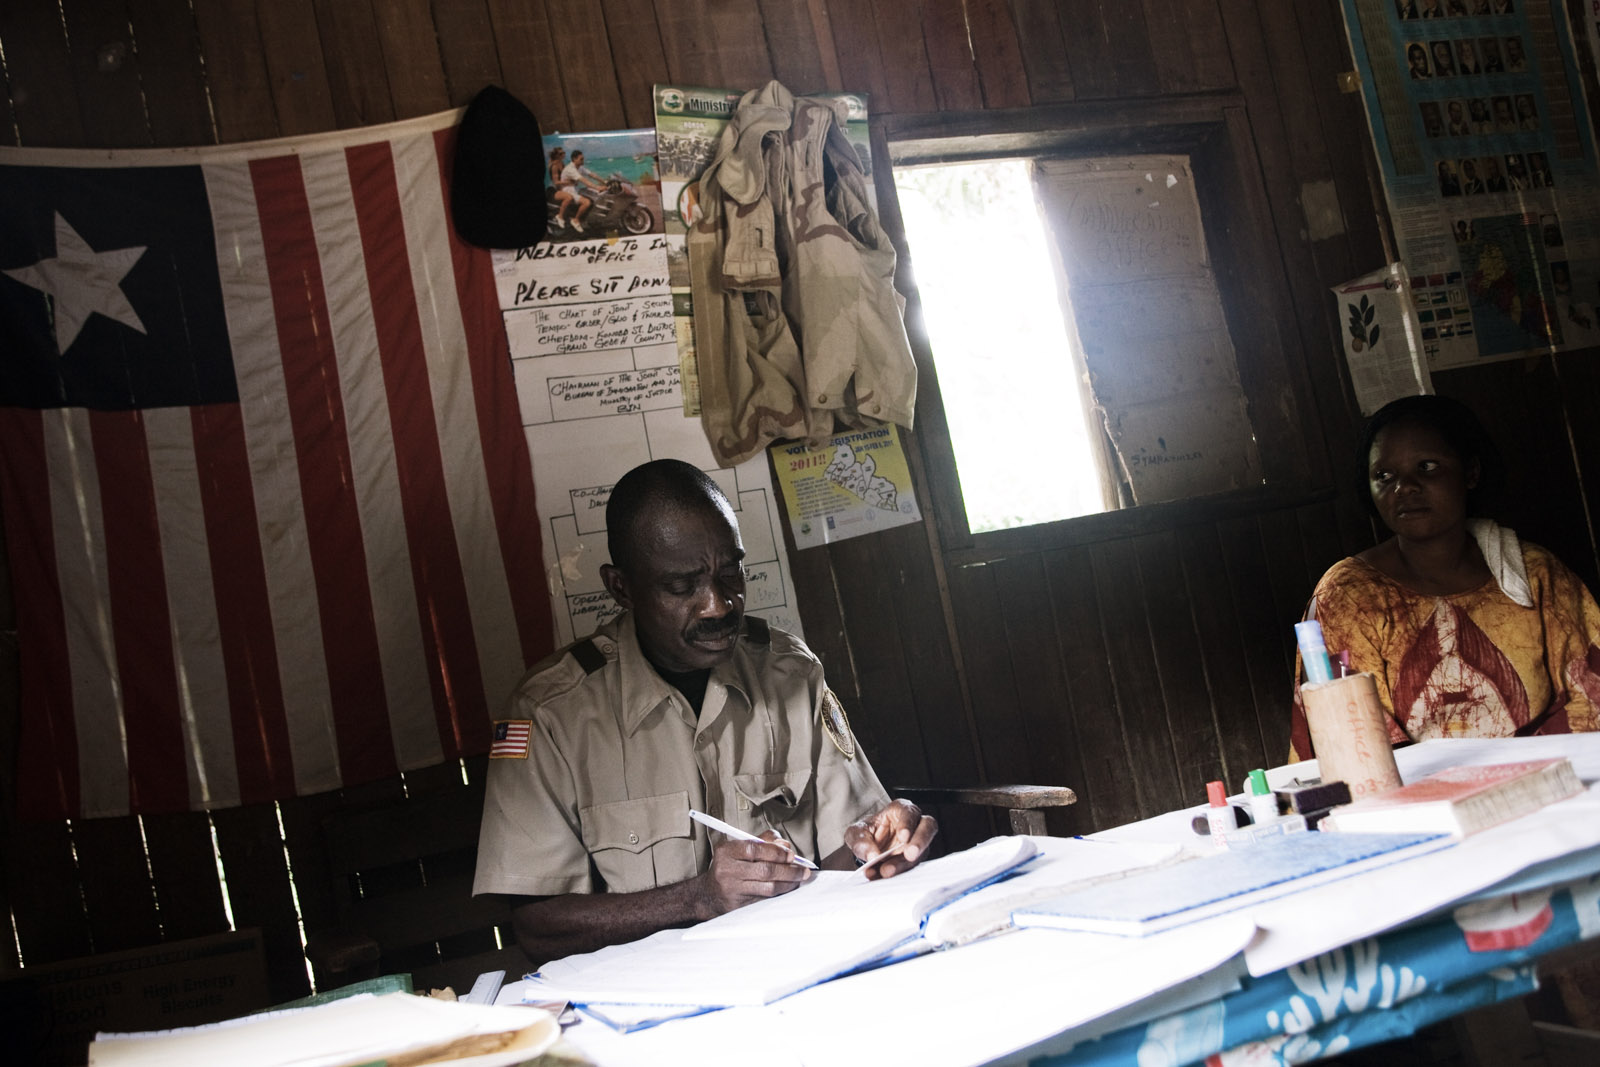 liberia-refugies-ivoiriens-0311-0362hd